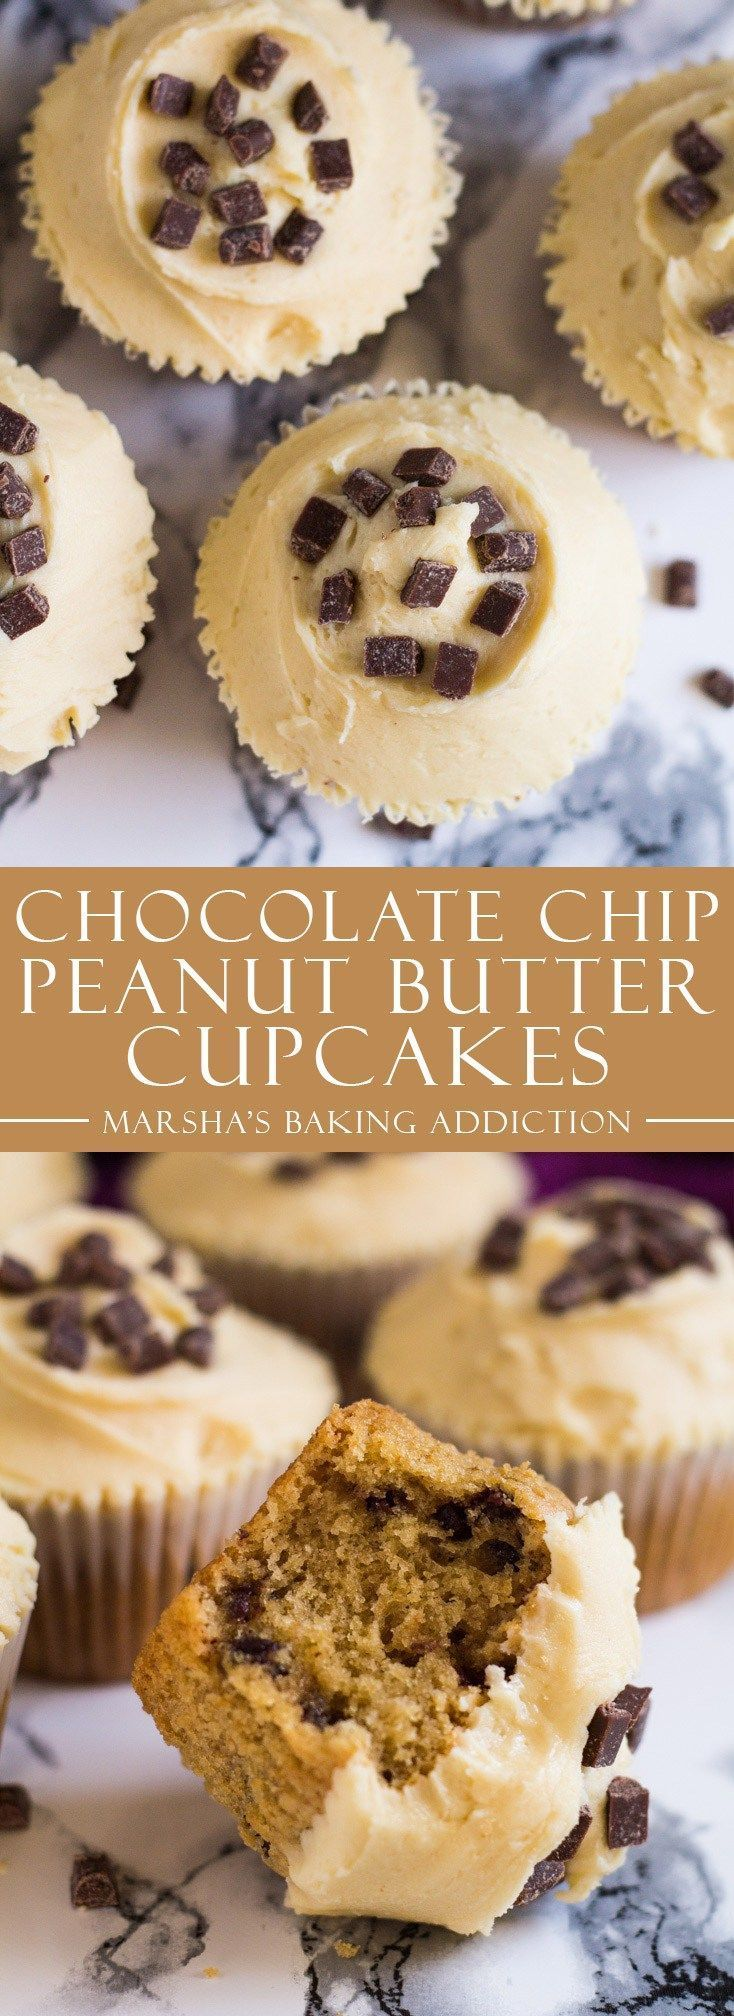 Chocolate Chip Peanut Butter Cupcakes | http://marshasbakingaddiction.com /marshasbakeblog/